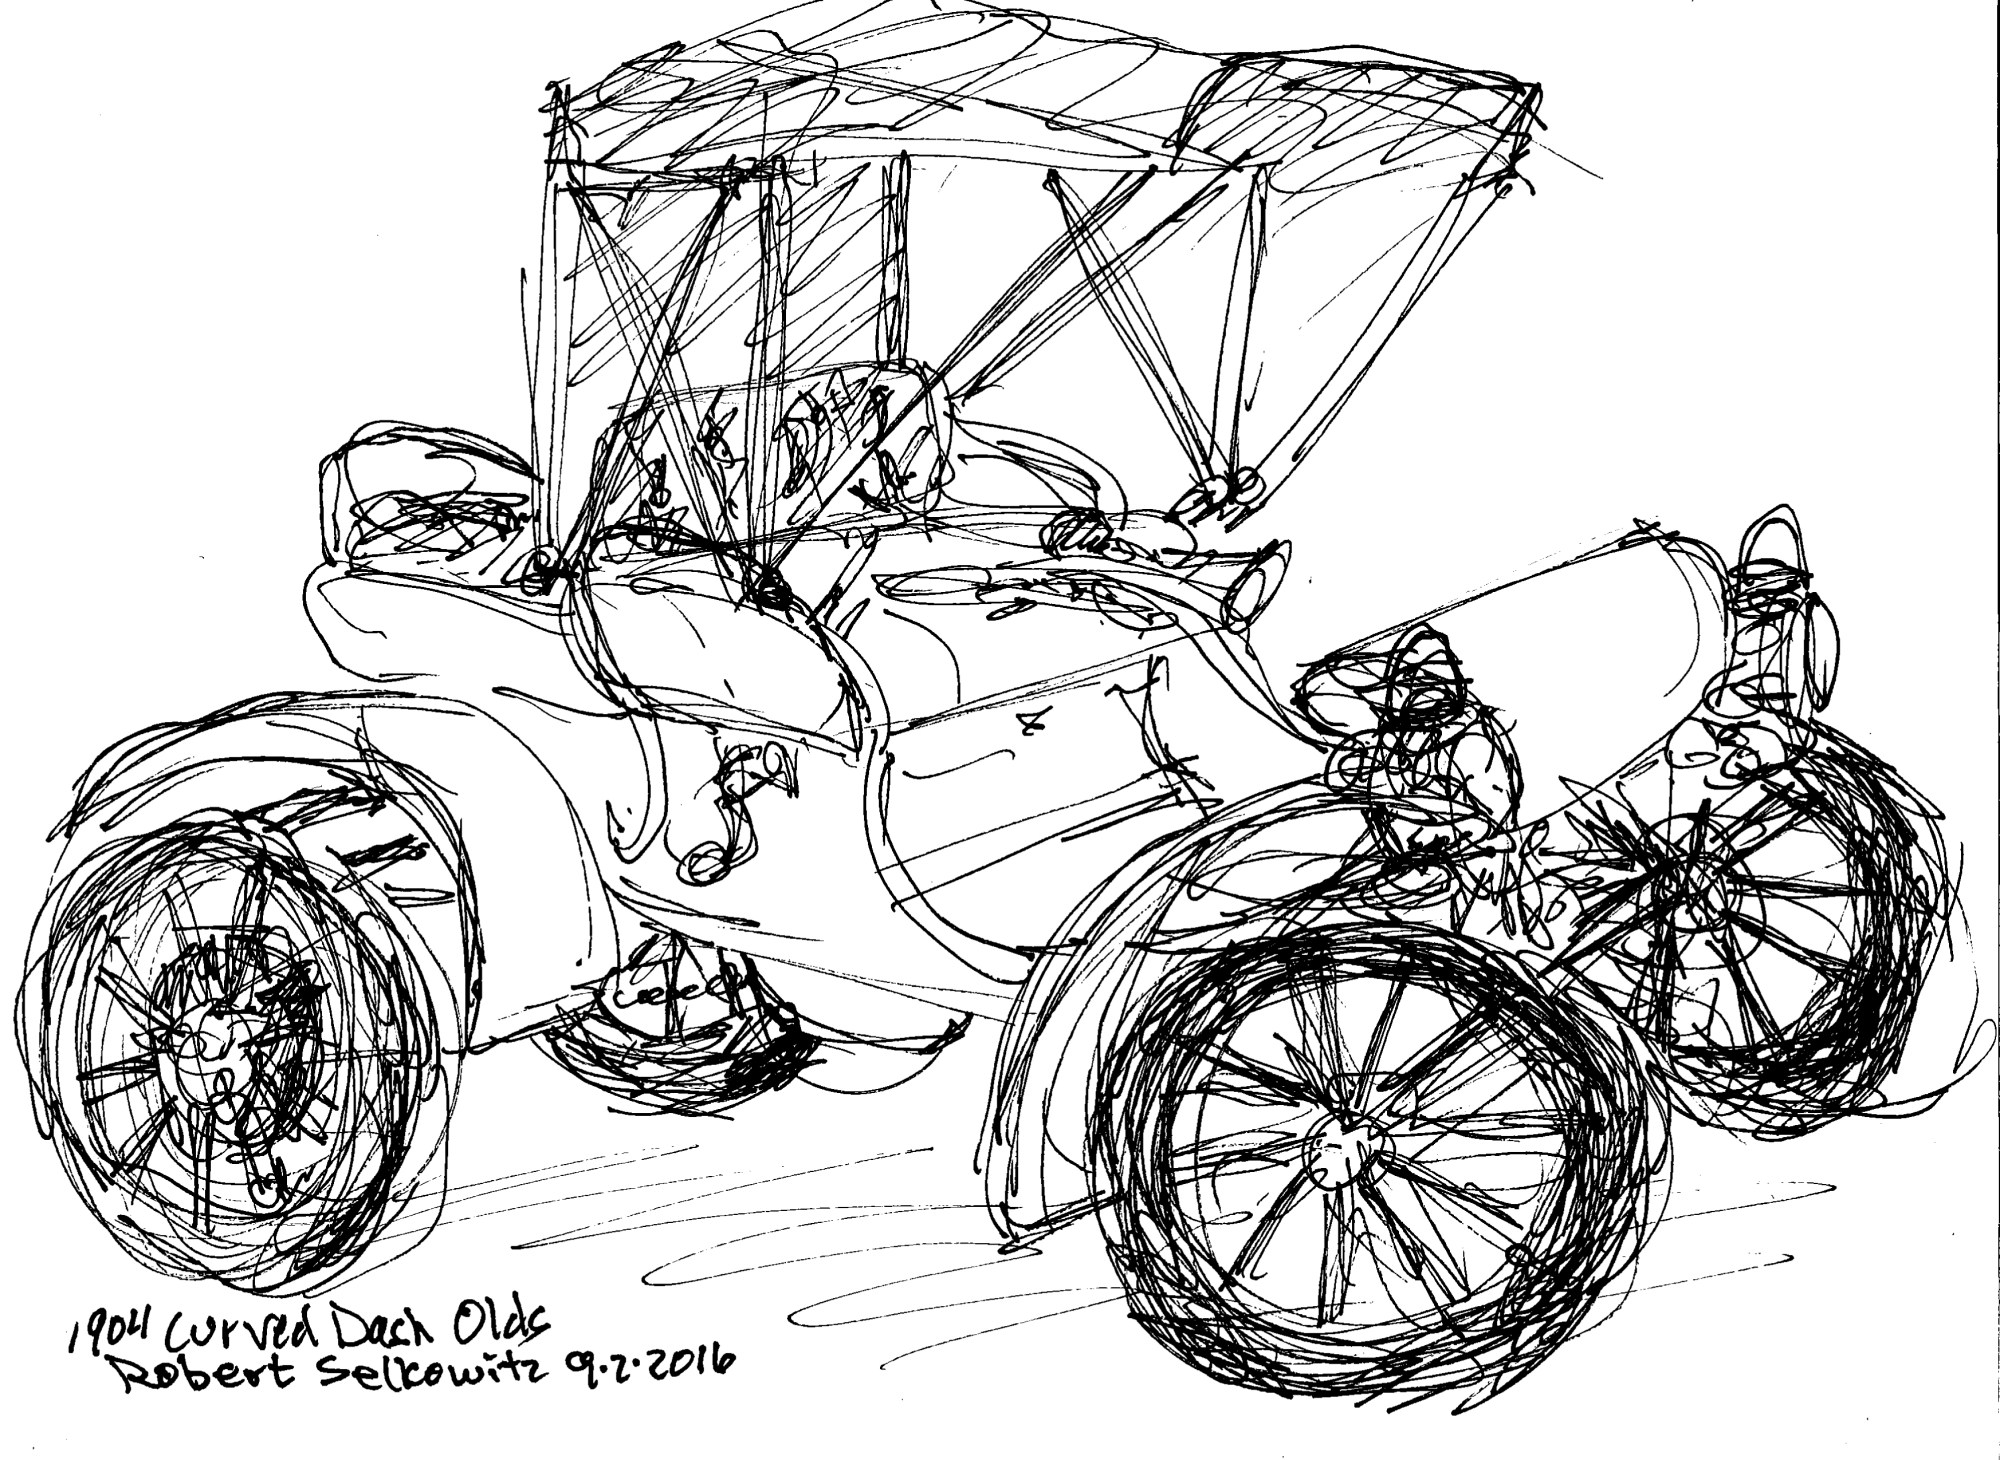 hight resolution of 3491x2550 pilot rally catskill historic automobile endurance runs